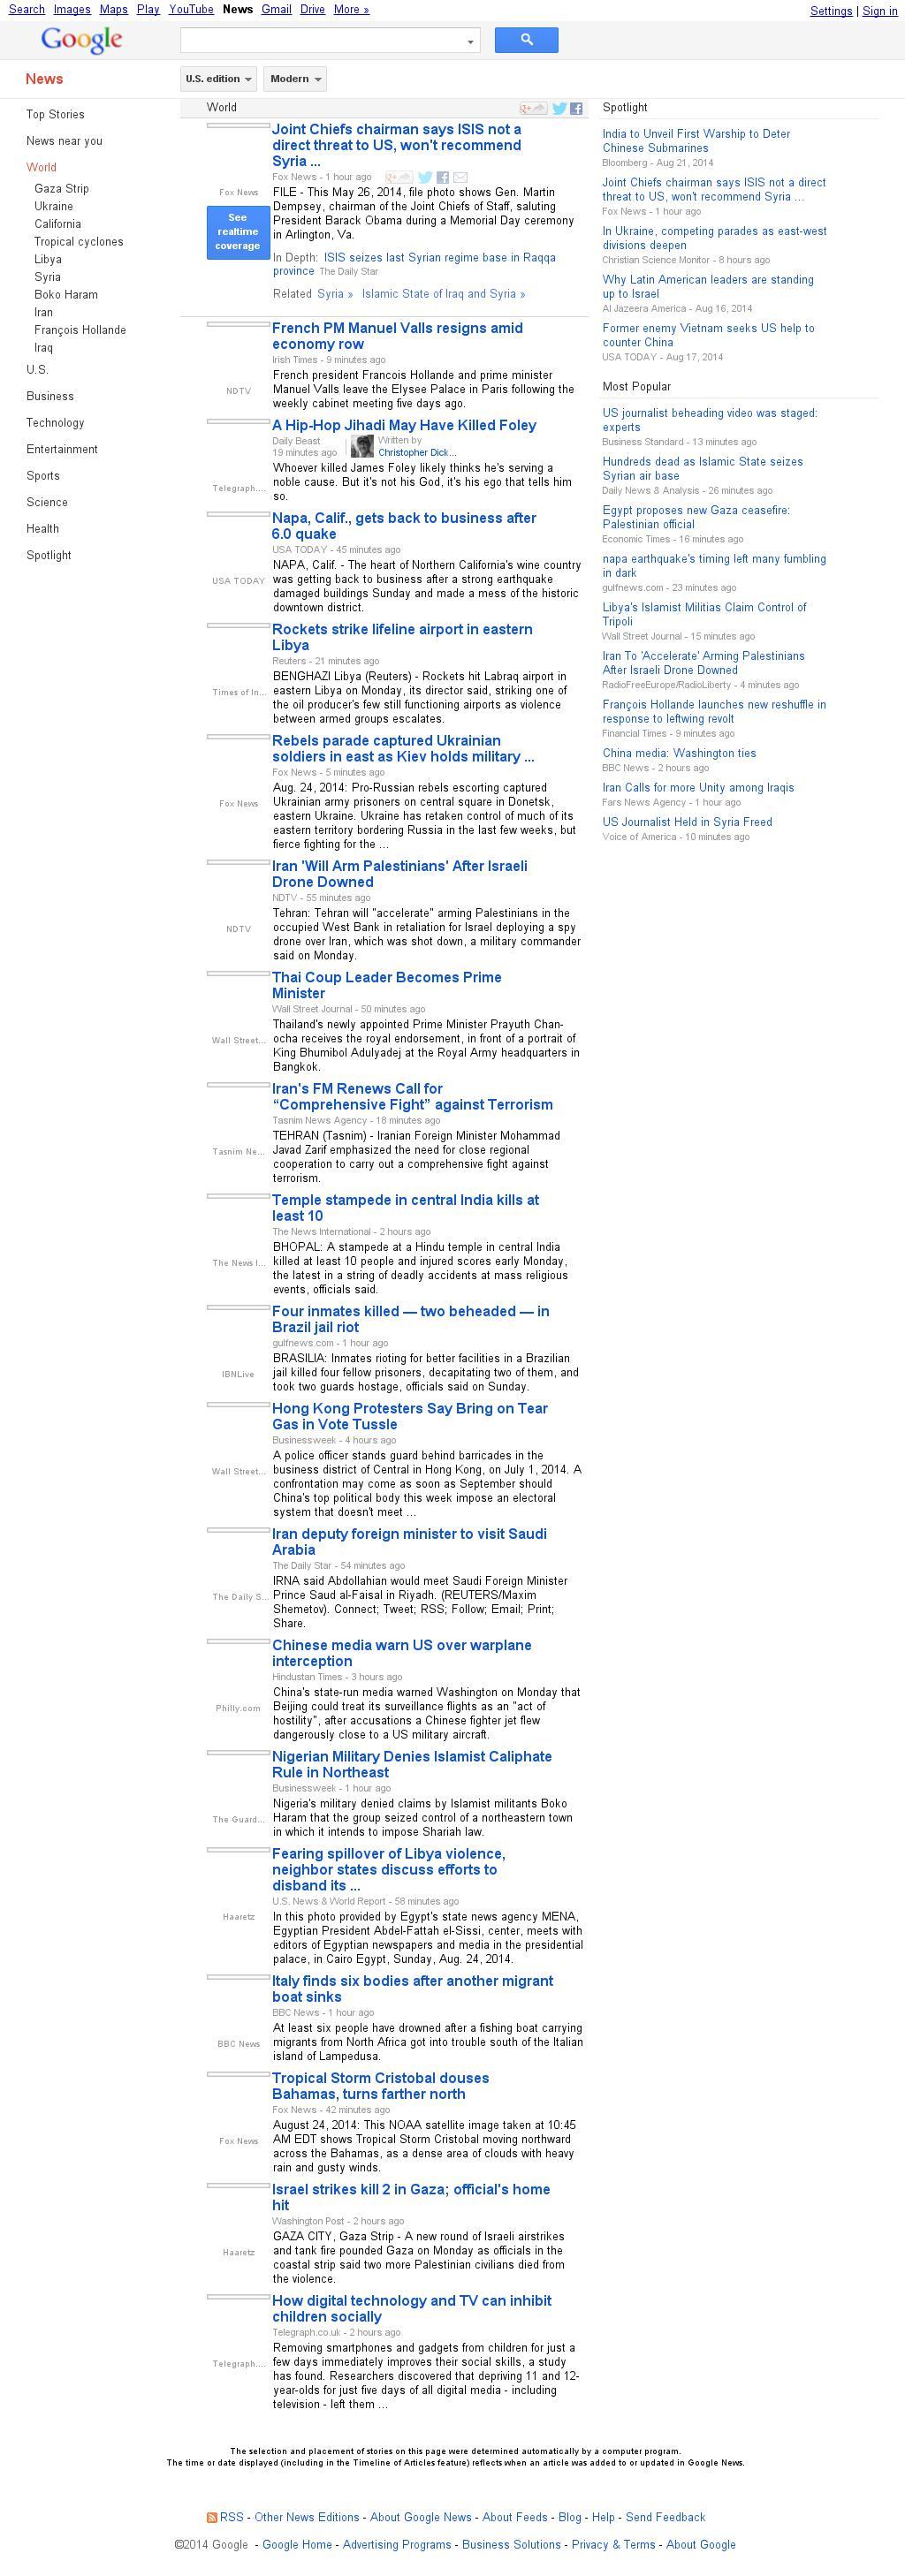 Google News: World at Monday Aug. 25, 2014, 10:09 a.m. UTC